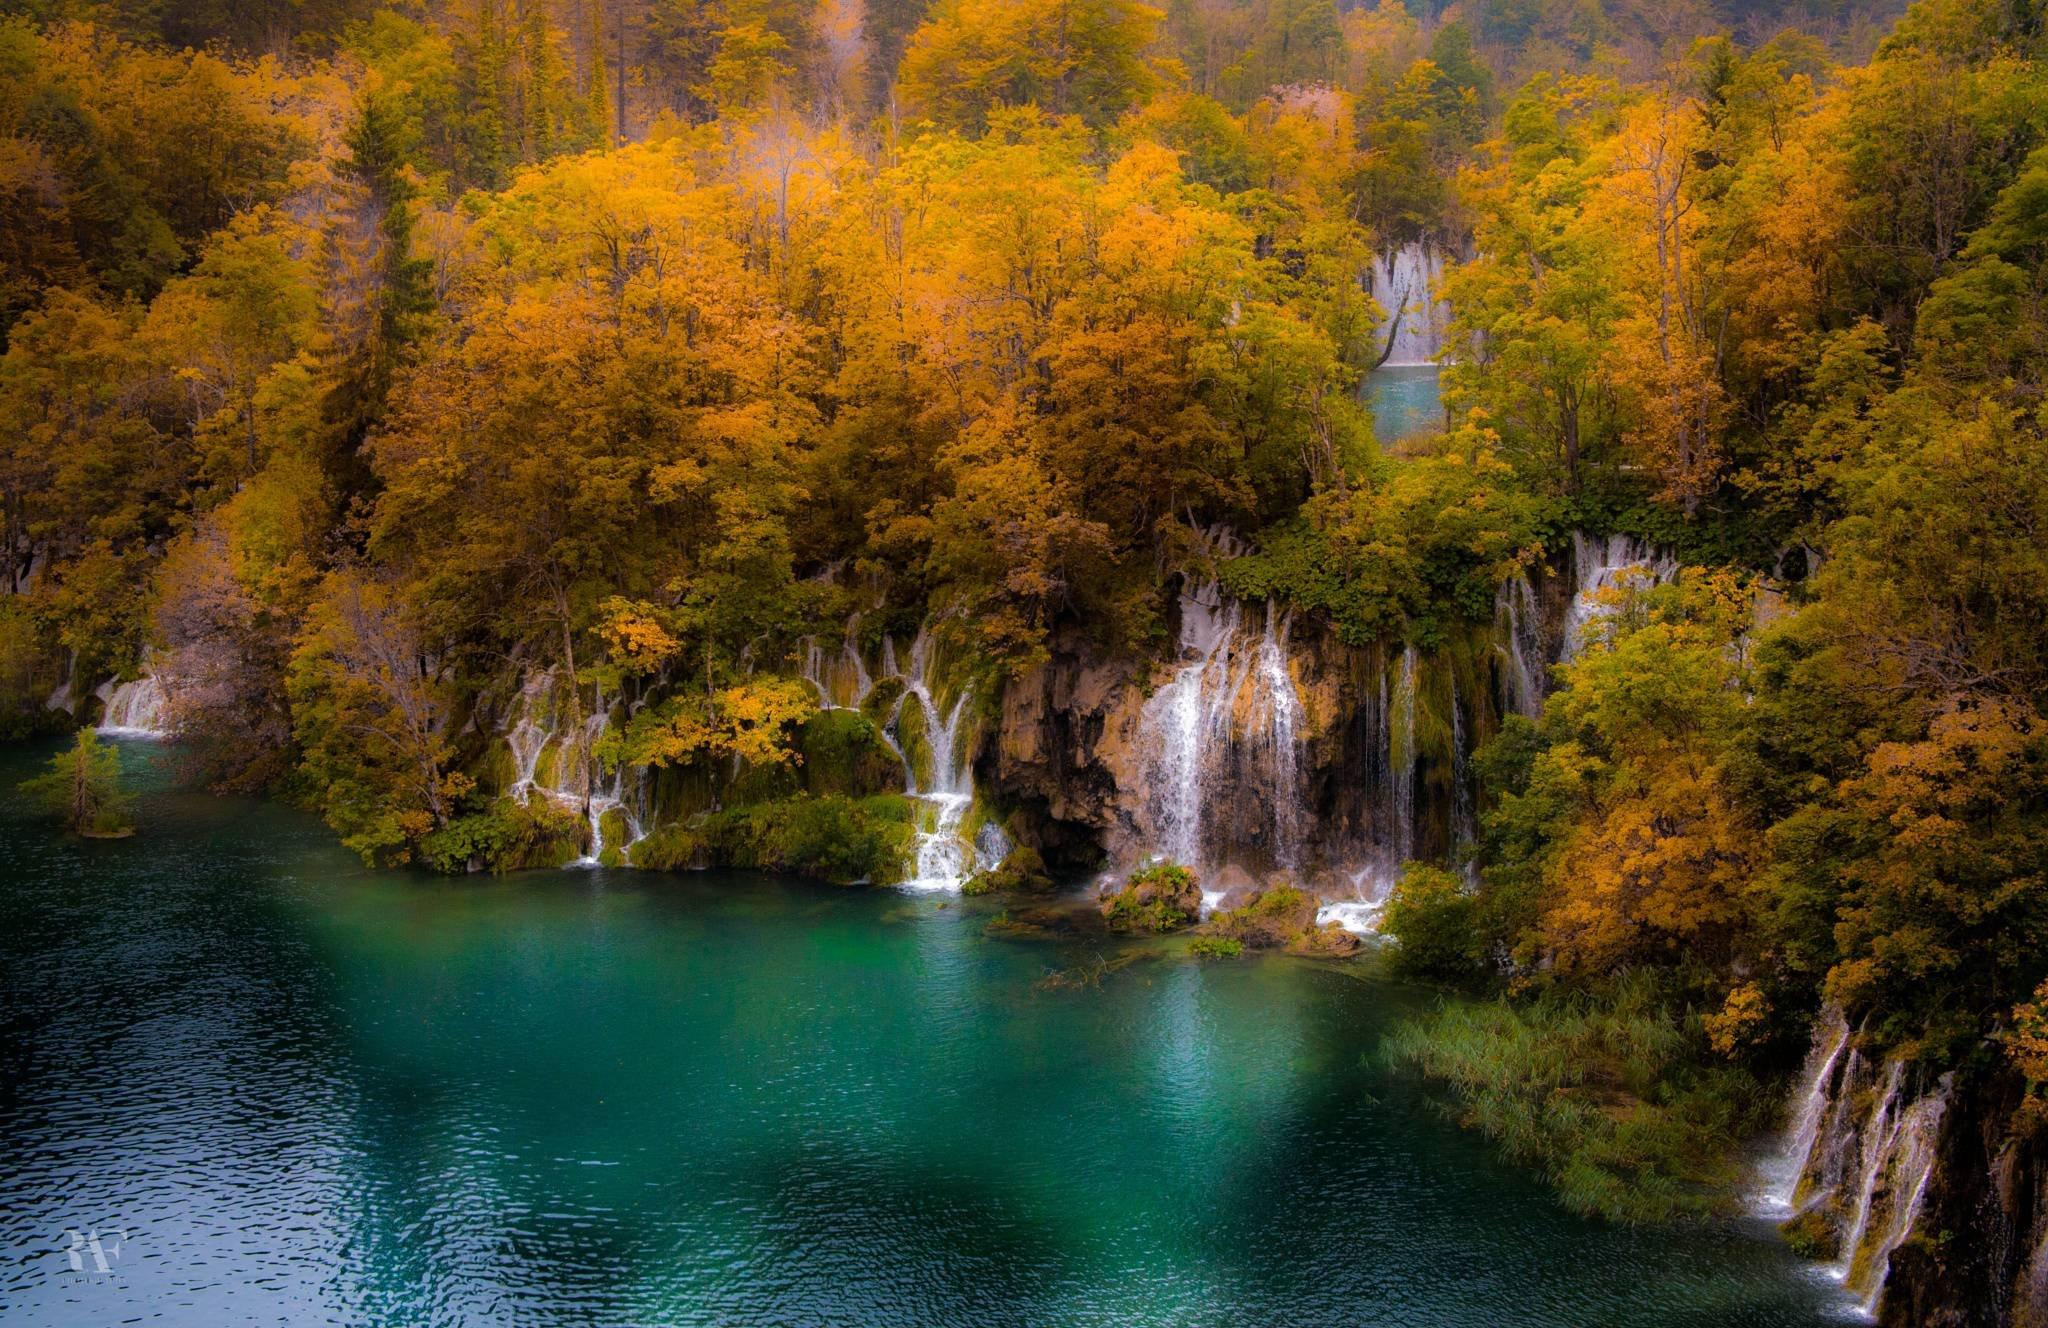 Pin Veliki Slap Plitvice National Park Images To Pinterest